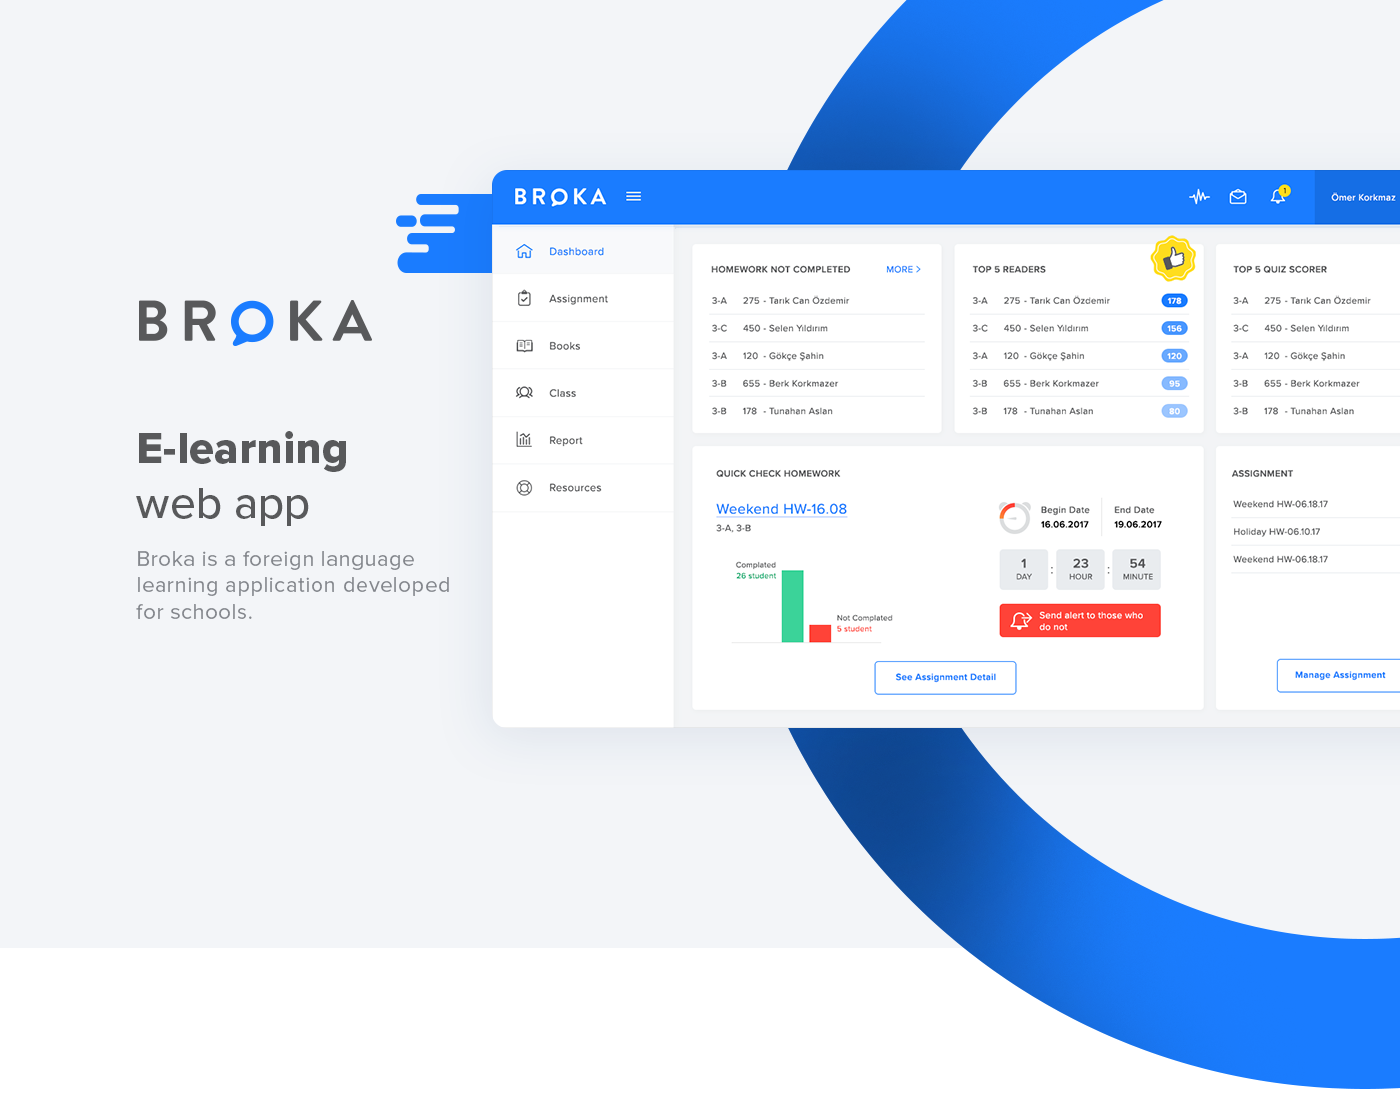 webapp e-learning Education learning Reading dashboard report student teacher management